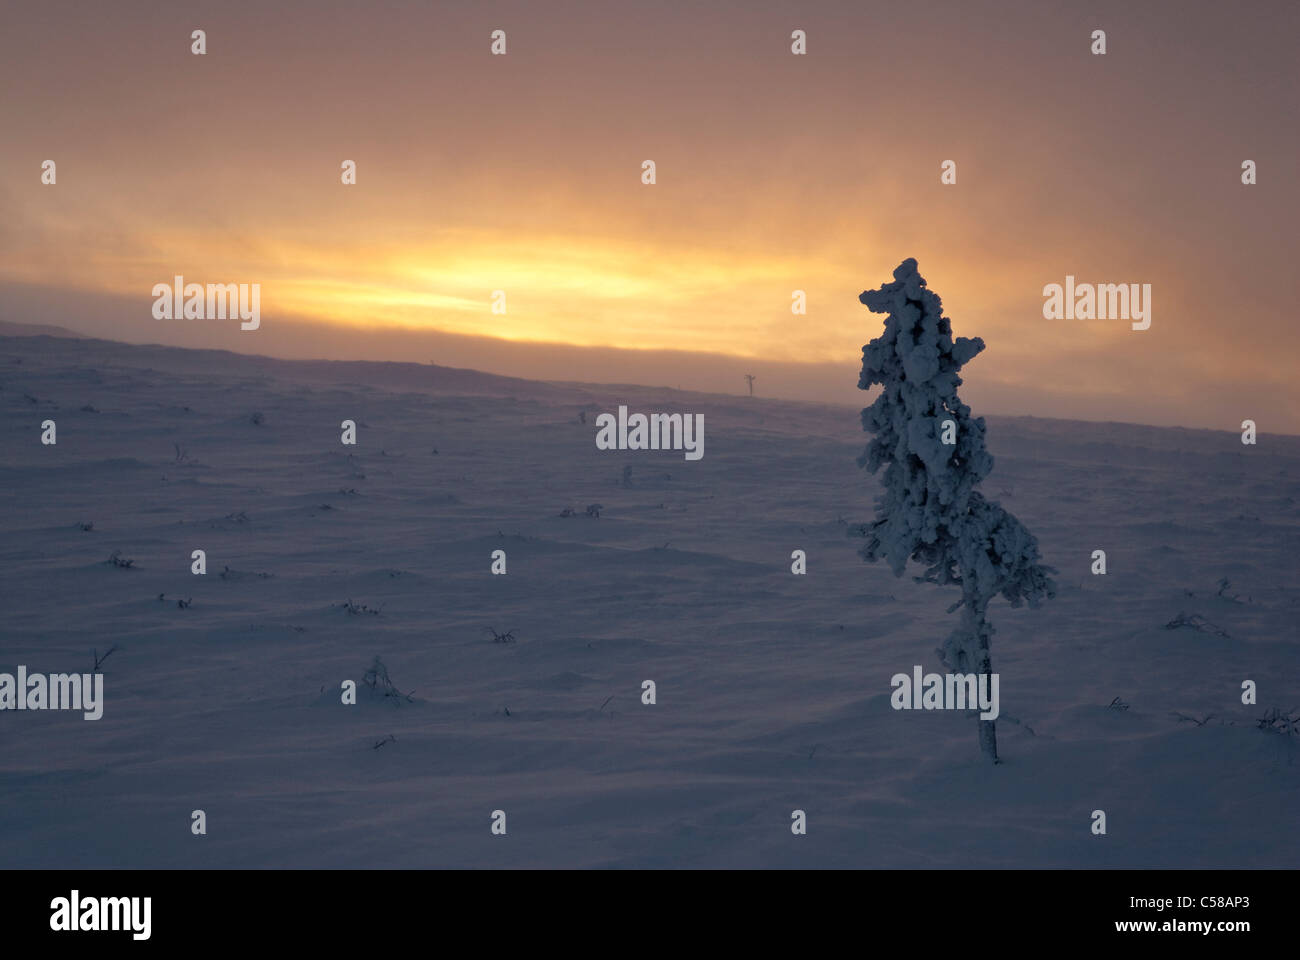 Arktis, Einsamkeit, Europa, Finnland, Fjell, Fjall, Kiilopaa, kalt, Lappland, Licht, Melancholie, Morgen, Morgendämmerung, Stockbild